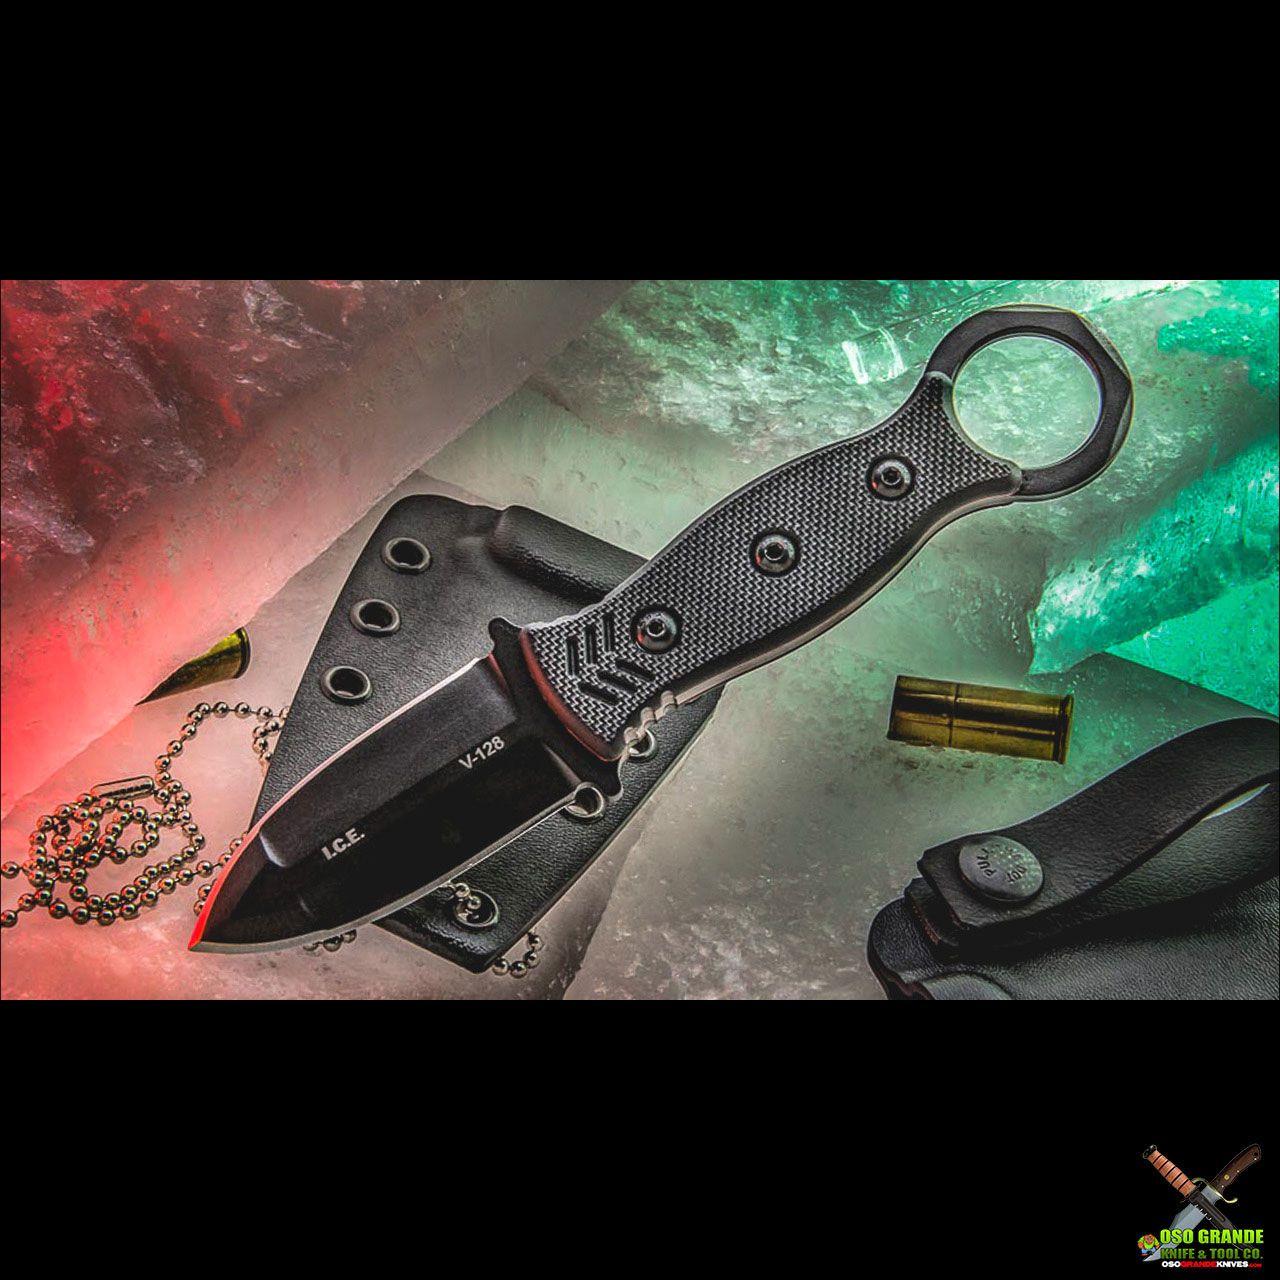 TOPS I.C.E. Dagger Fixed Blade Neck Knife w/ Beta Loops (3 in. Black) ICED-02 | OsoGrandeKnives